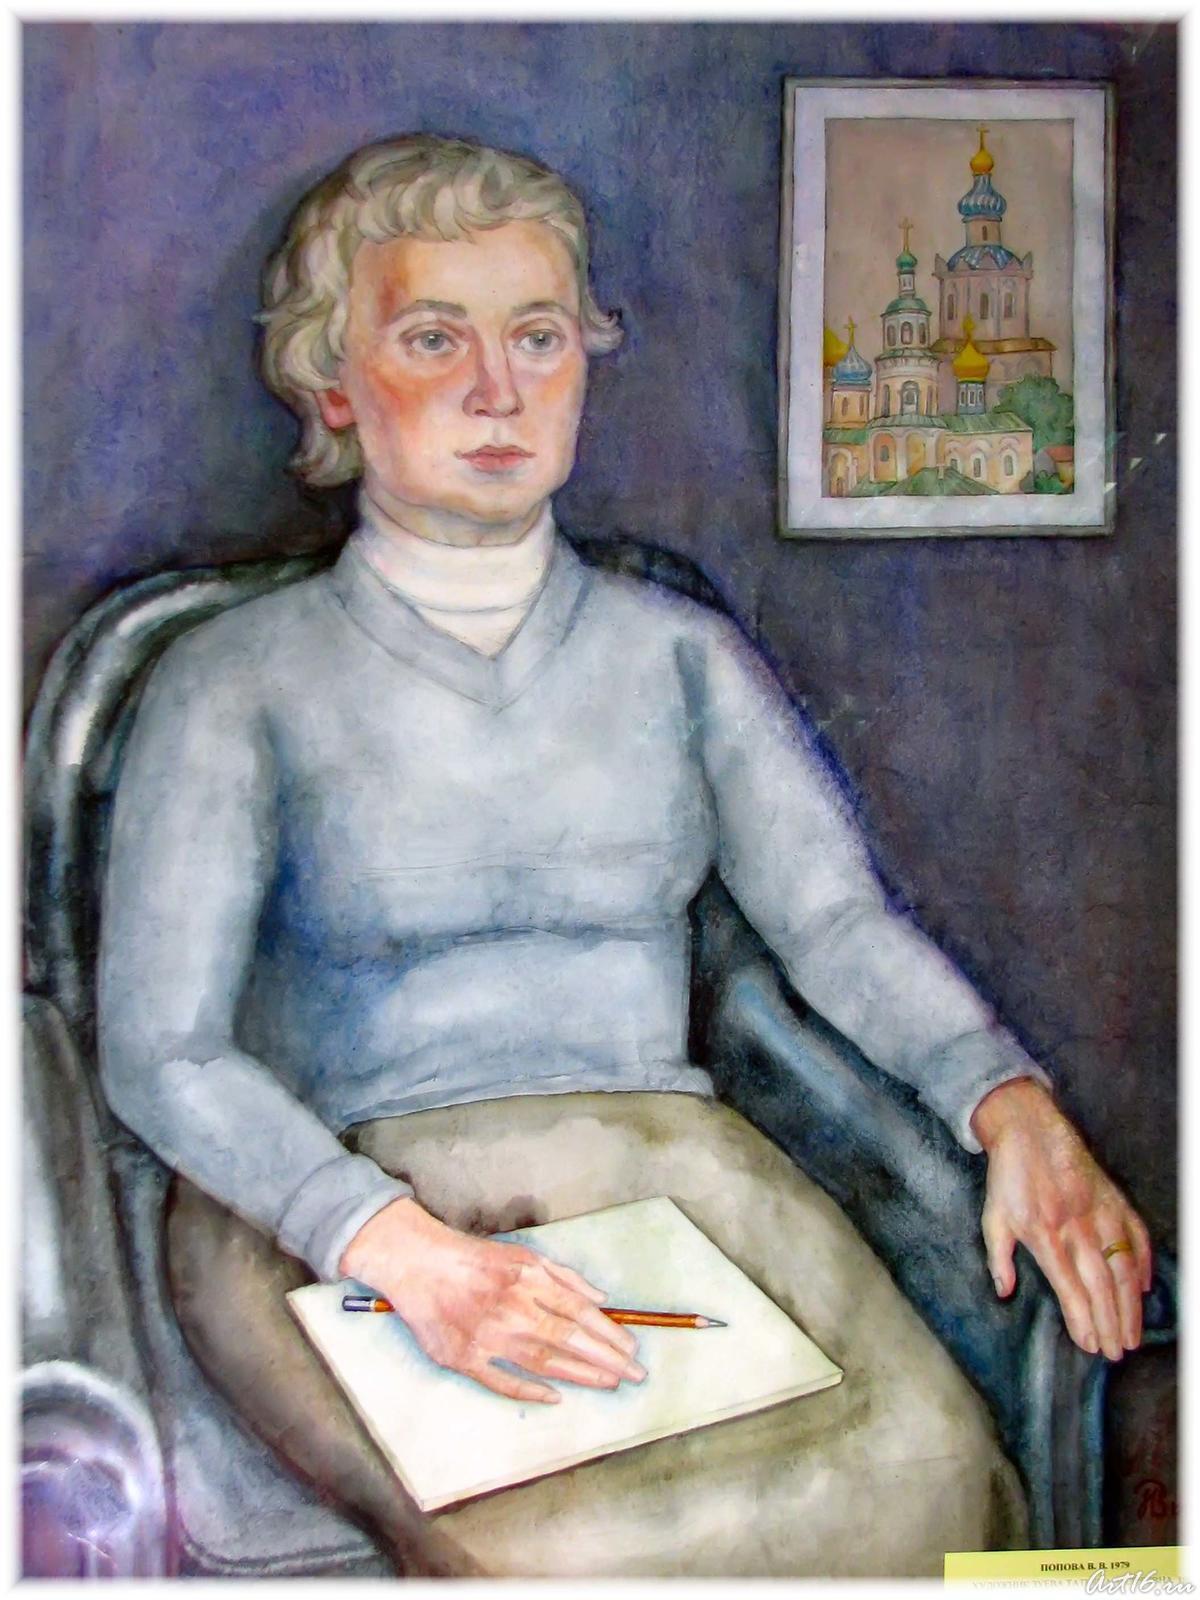 Фото №54688. Художник Зуева Татьяна Андреевна, 1998